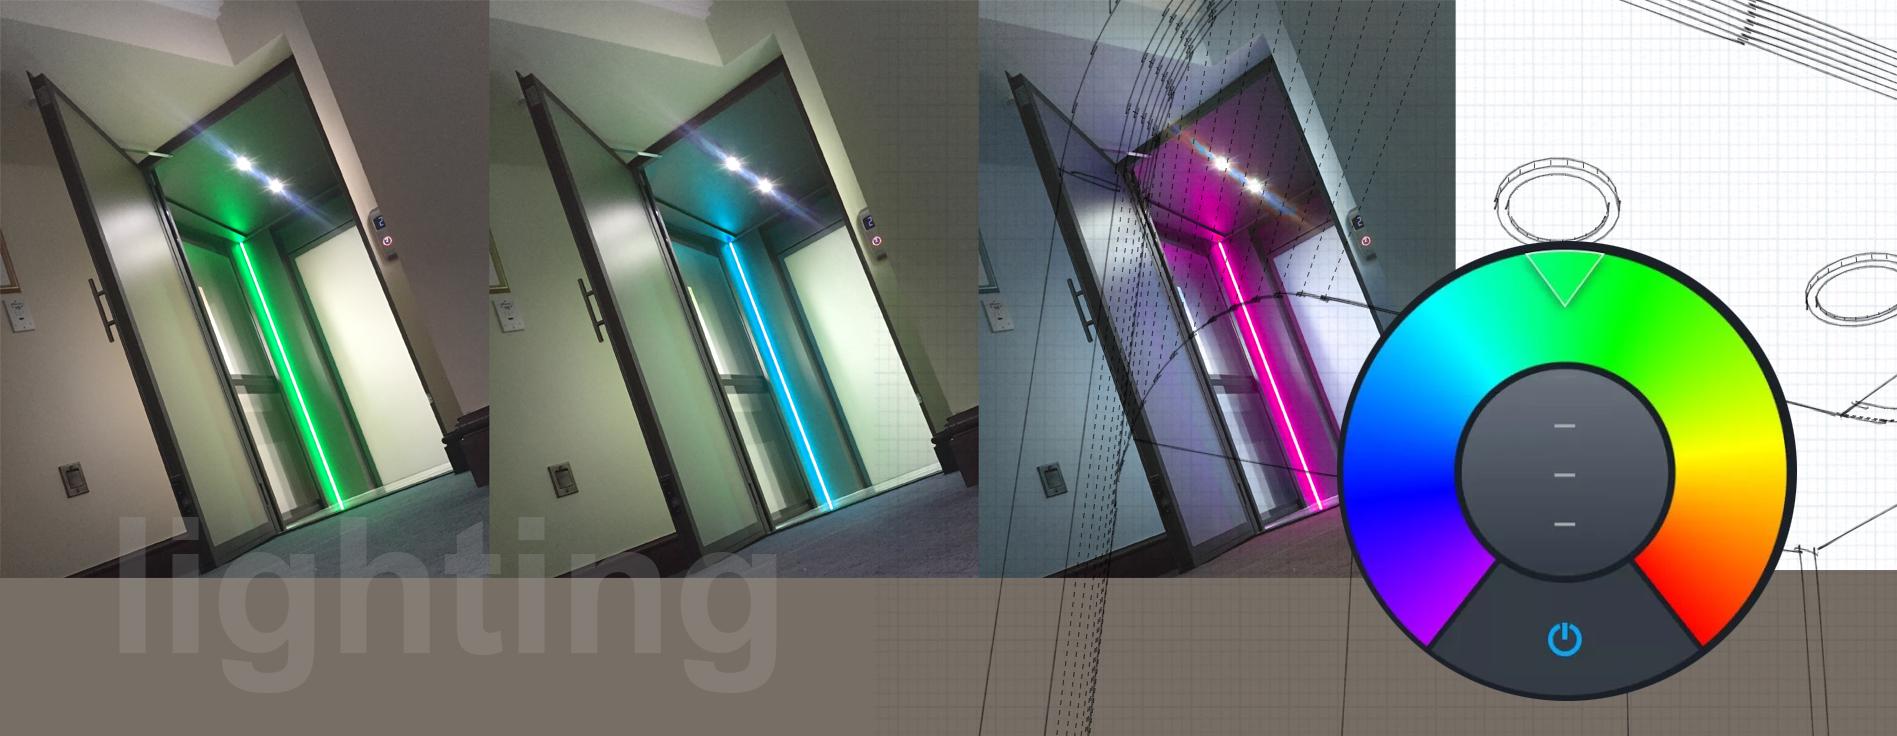 Smart Lighting - Smart Home Lift